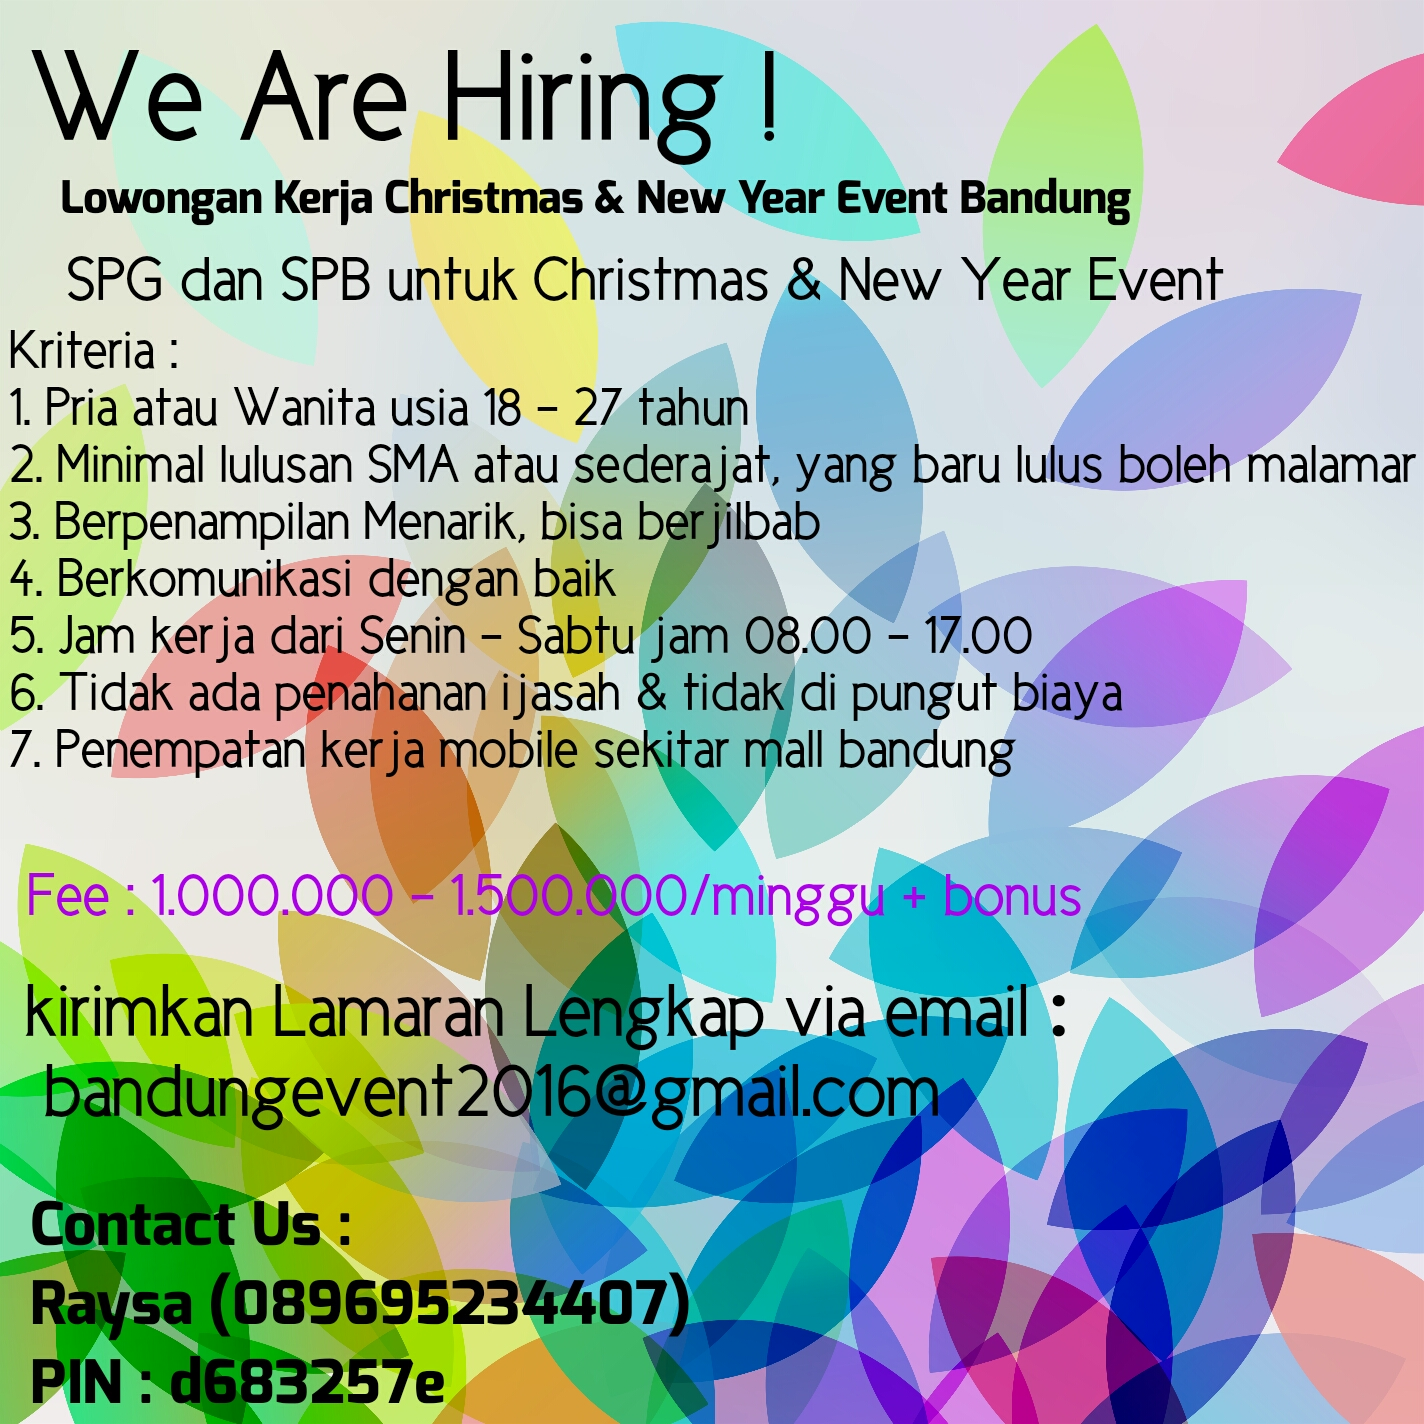 Lowongan Kerja Christmas & New Year Event Bandung